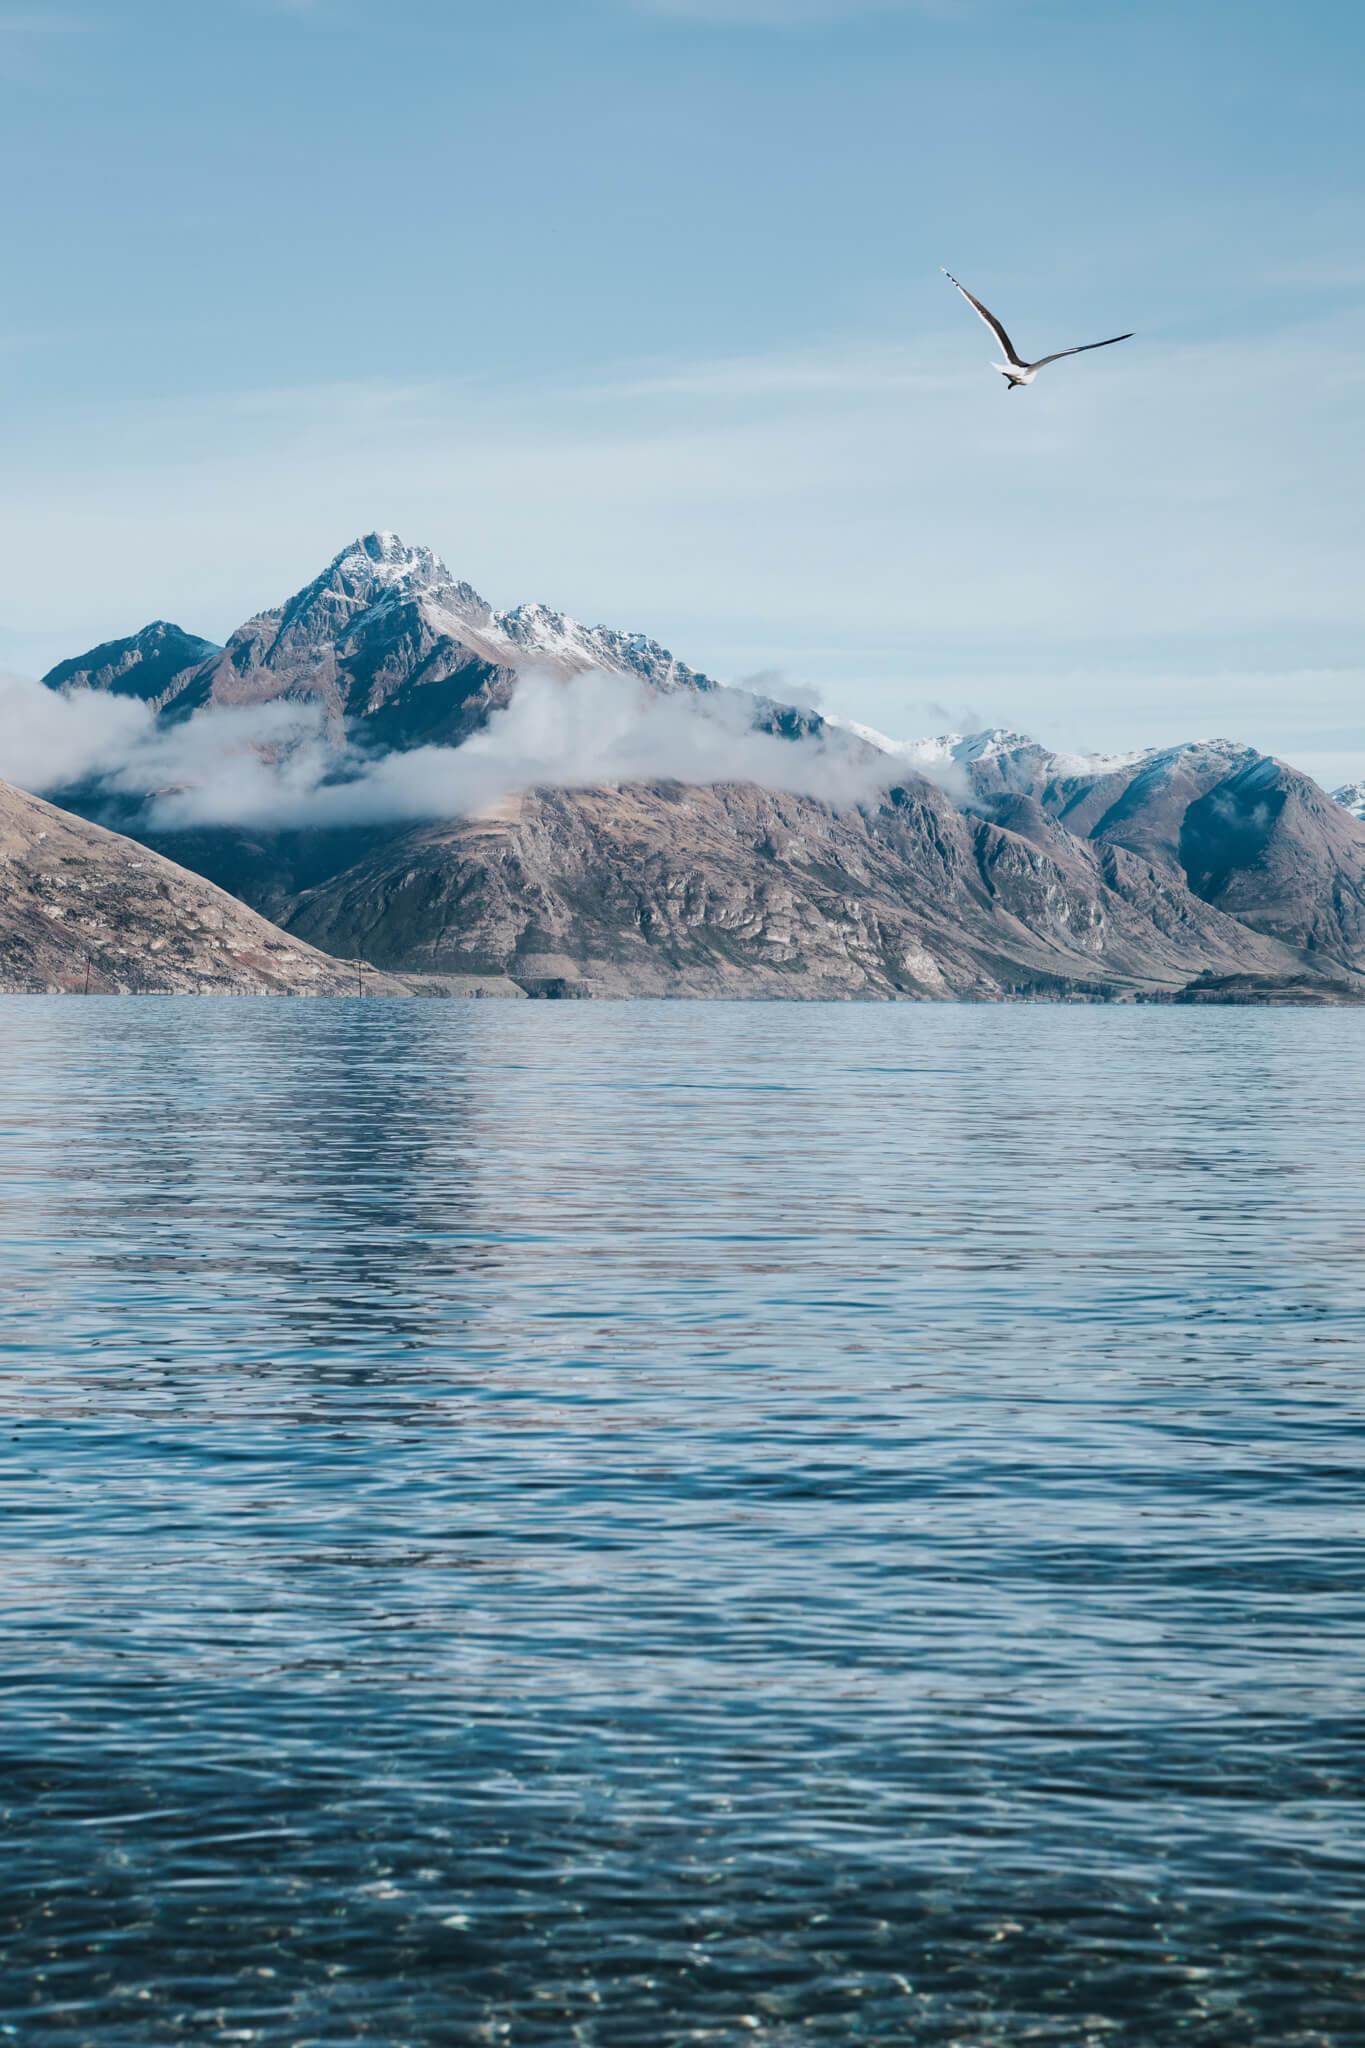 New-Zealand-Travel-Photography-Natalie-Skoric-1.jpg